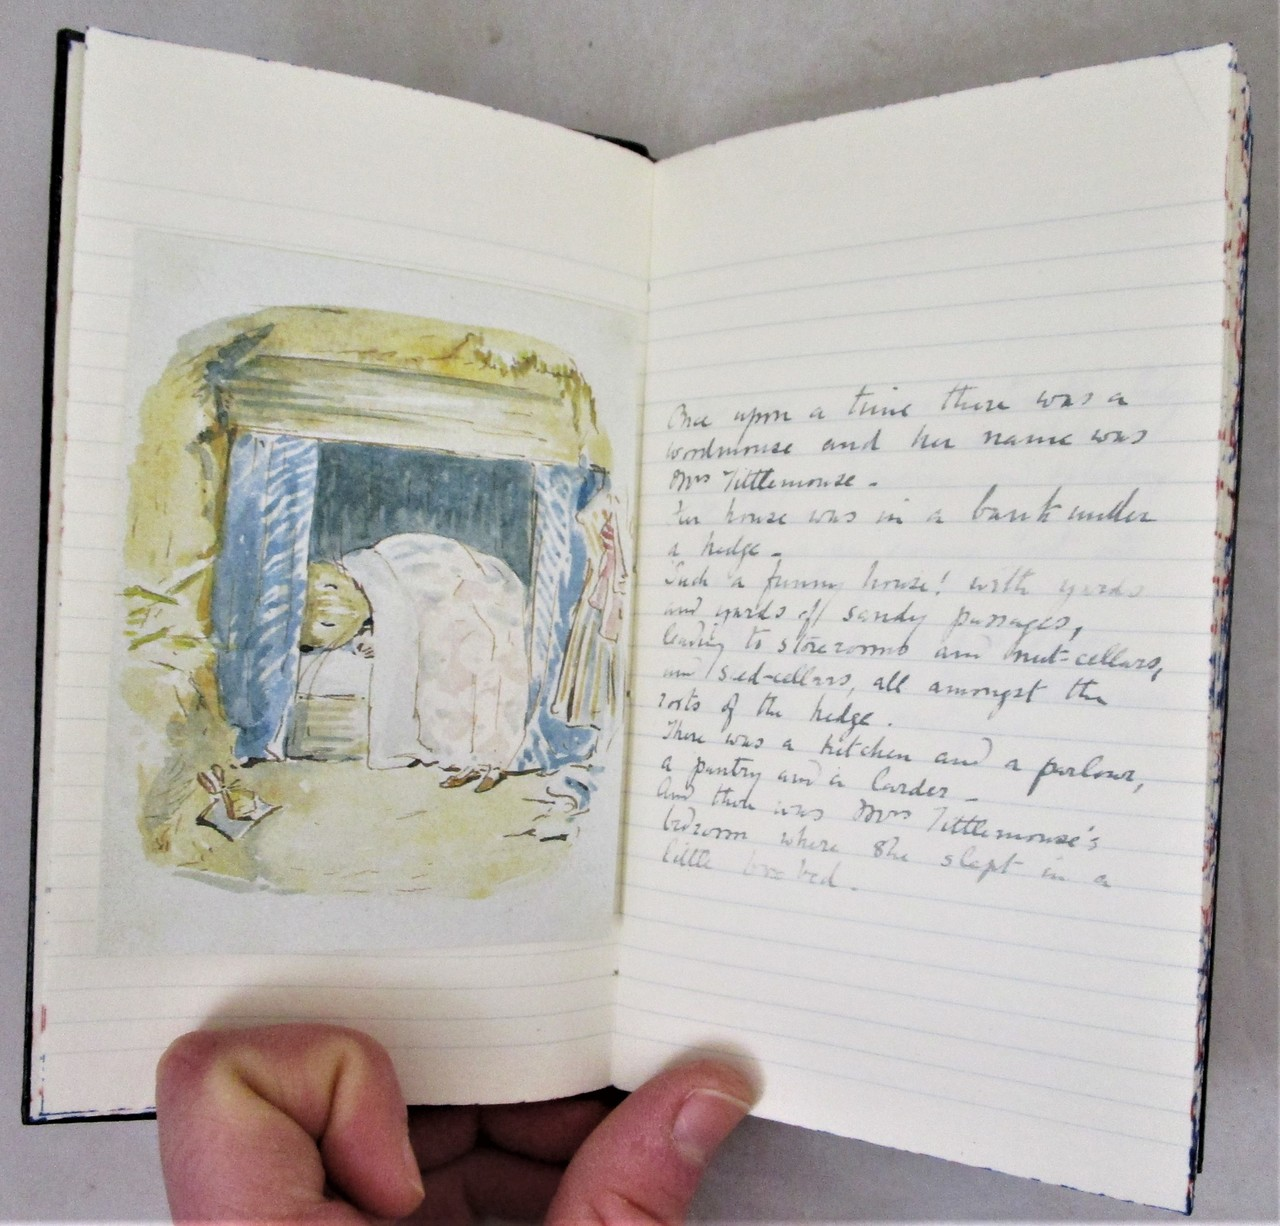 THE TALE OF MRS TITTLEMOUSE, by Beatrix Potter - 1979 [Ltd Ed Mss]